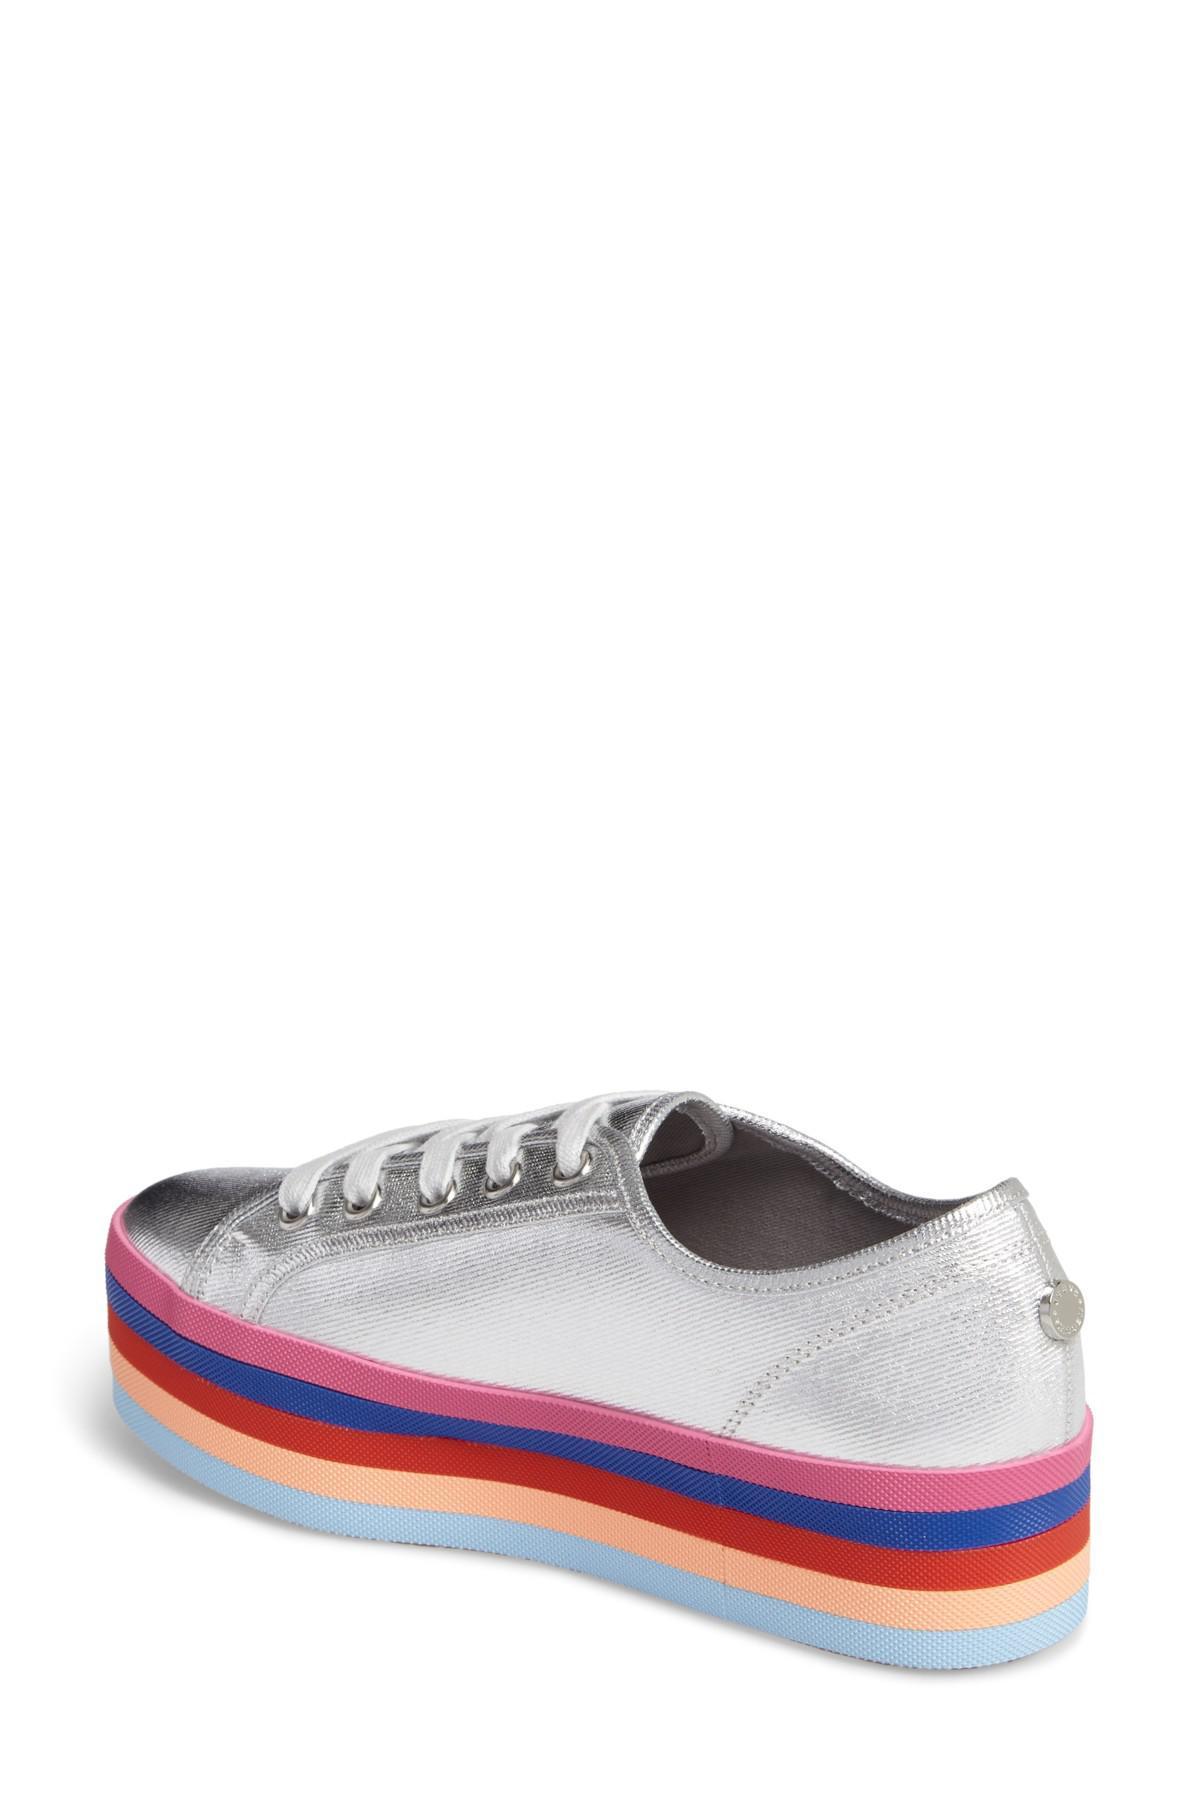 253d31be373 Lyst - Steve Madden Rainbow Stacked Platform Sneaker in Metallic